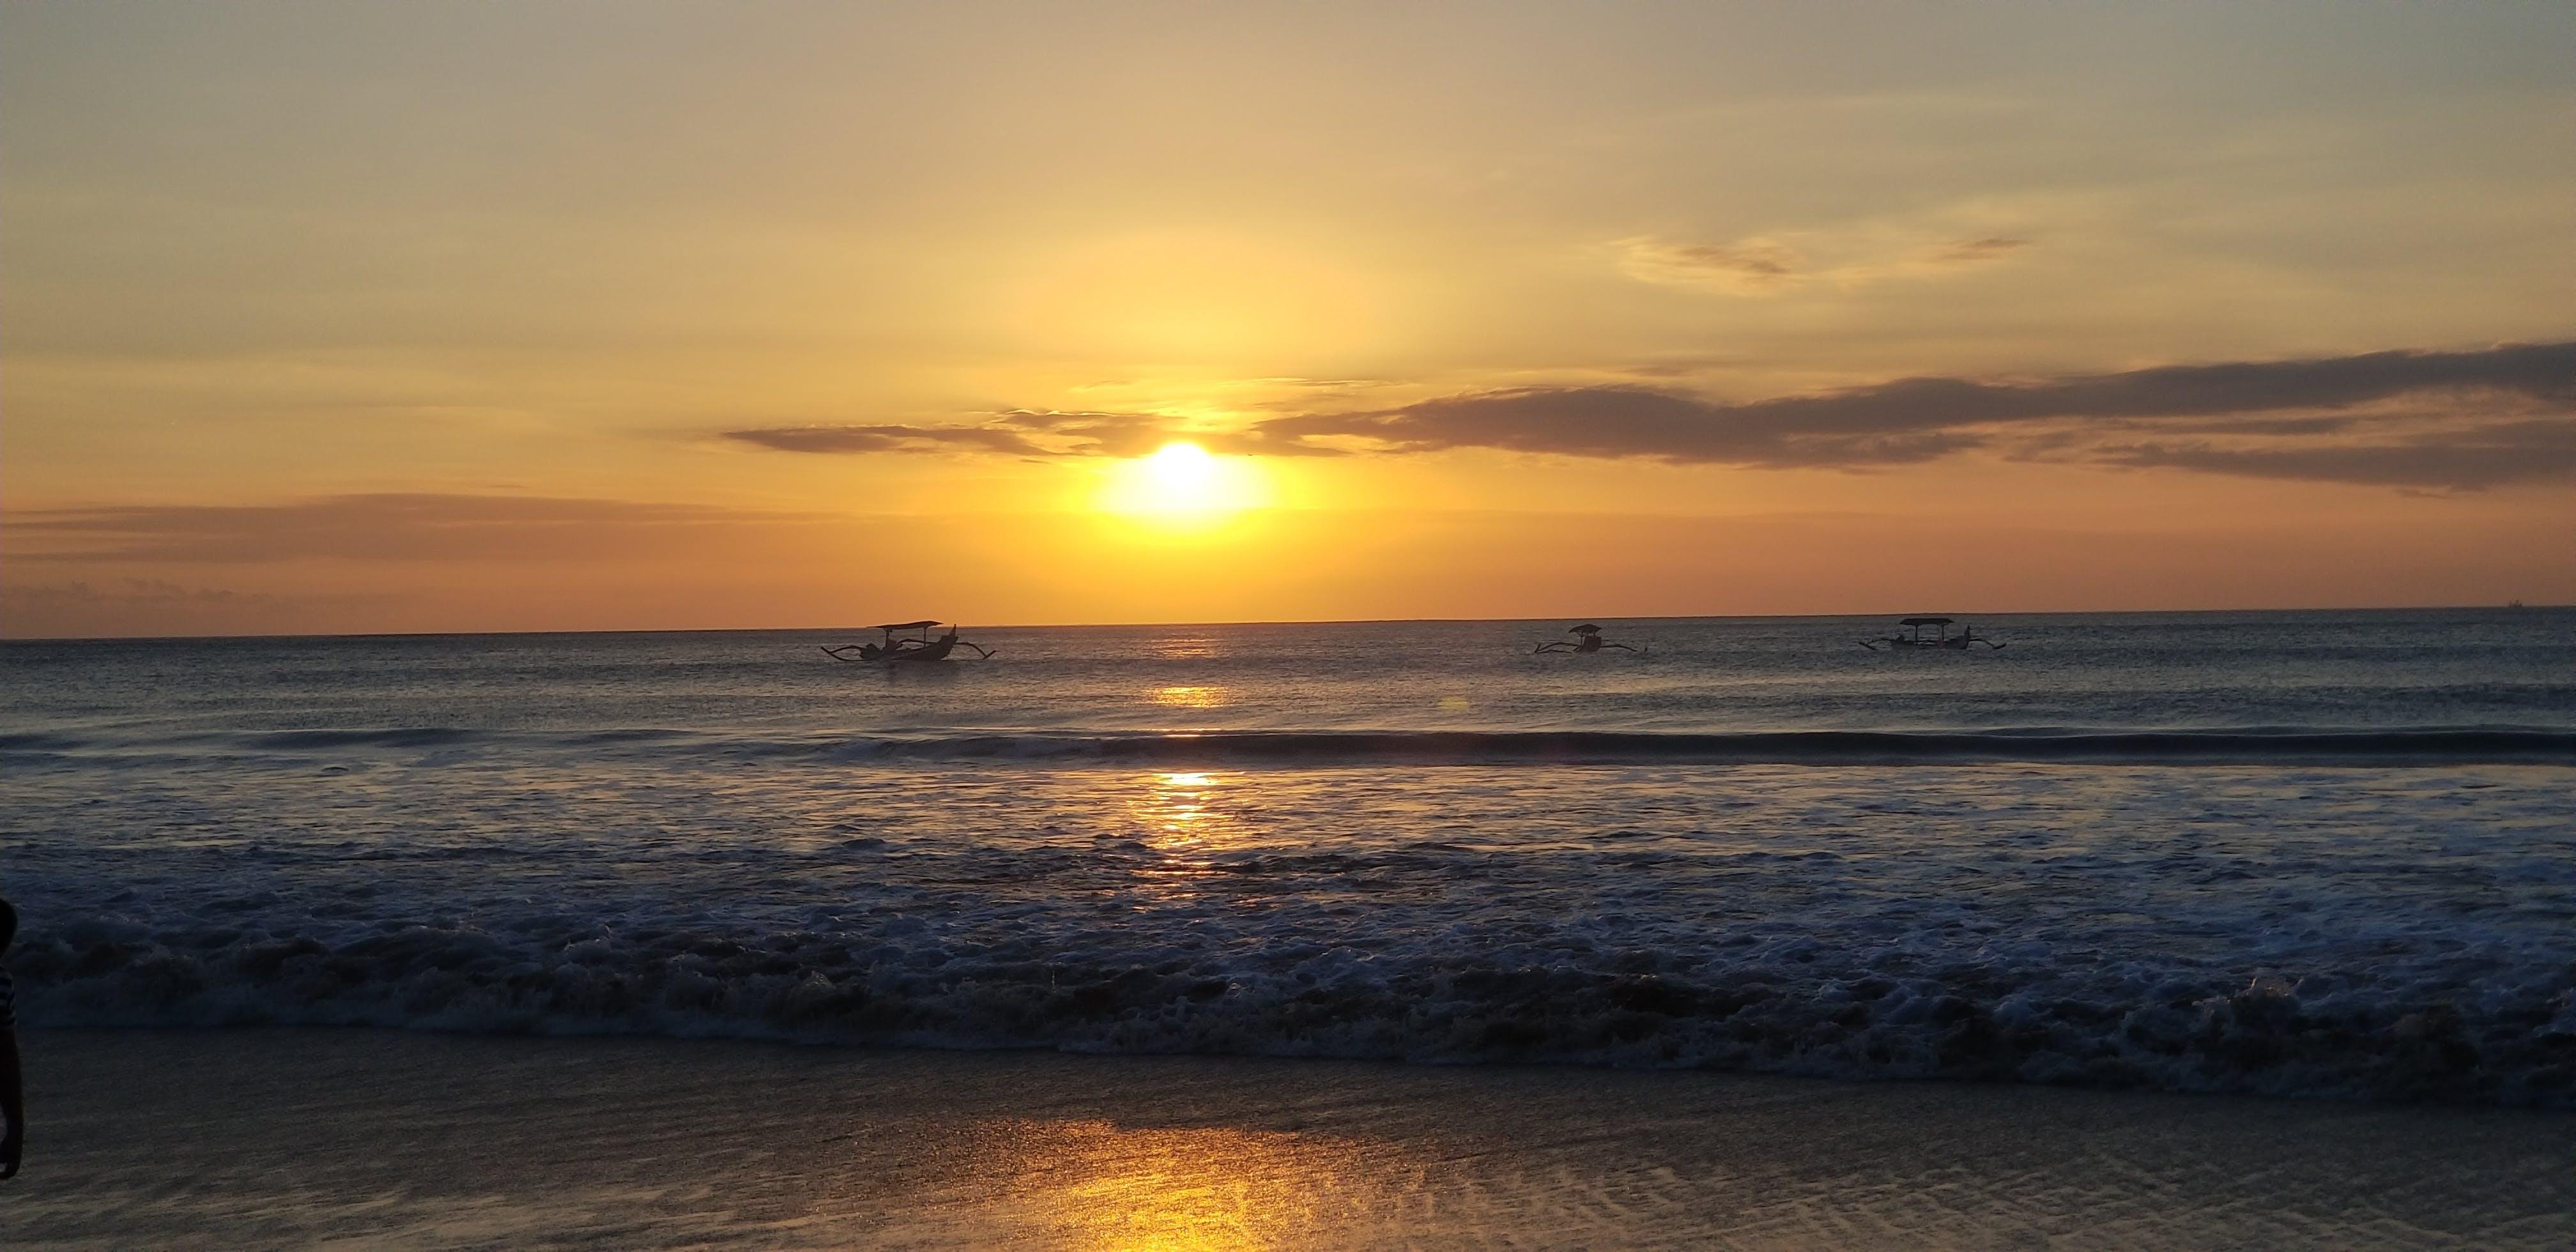 Free stock photo of Beautiful sunset in Bali